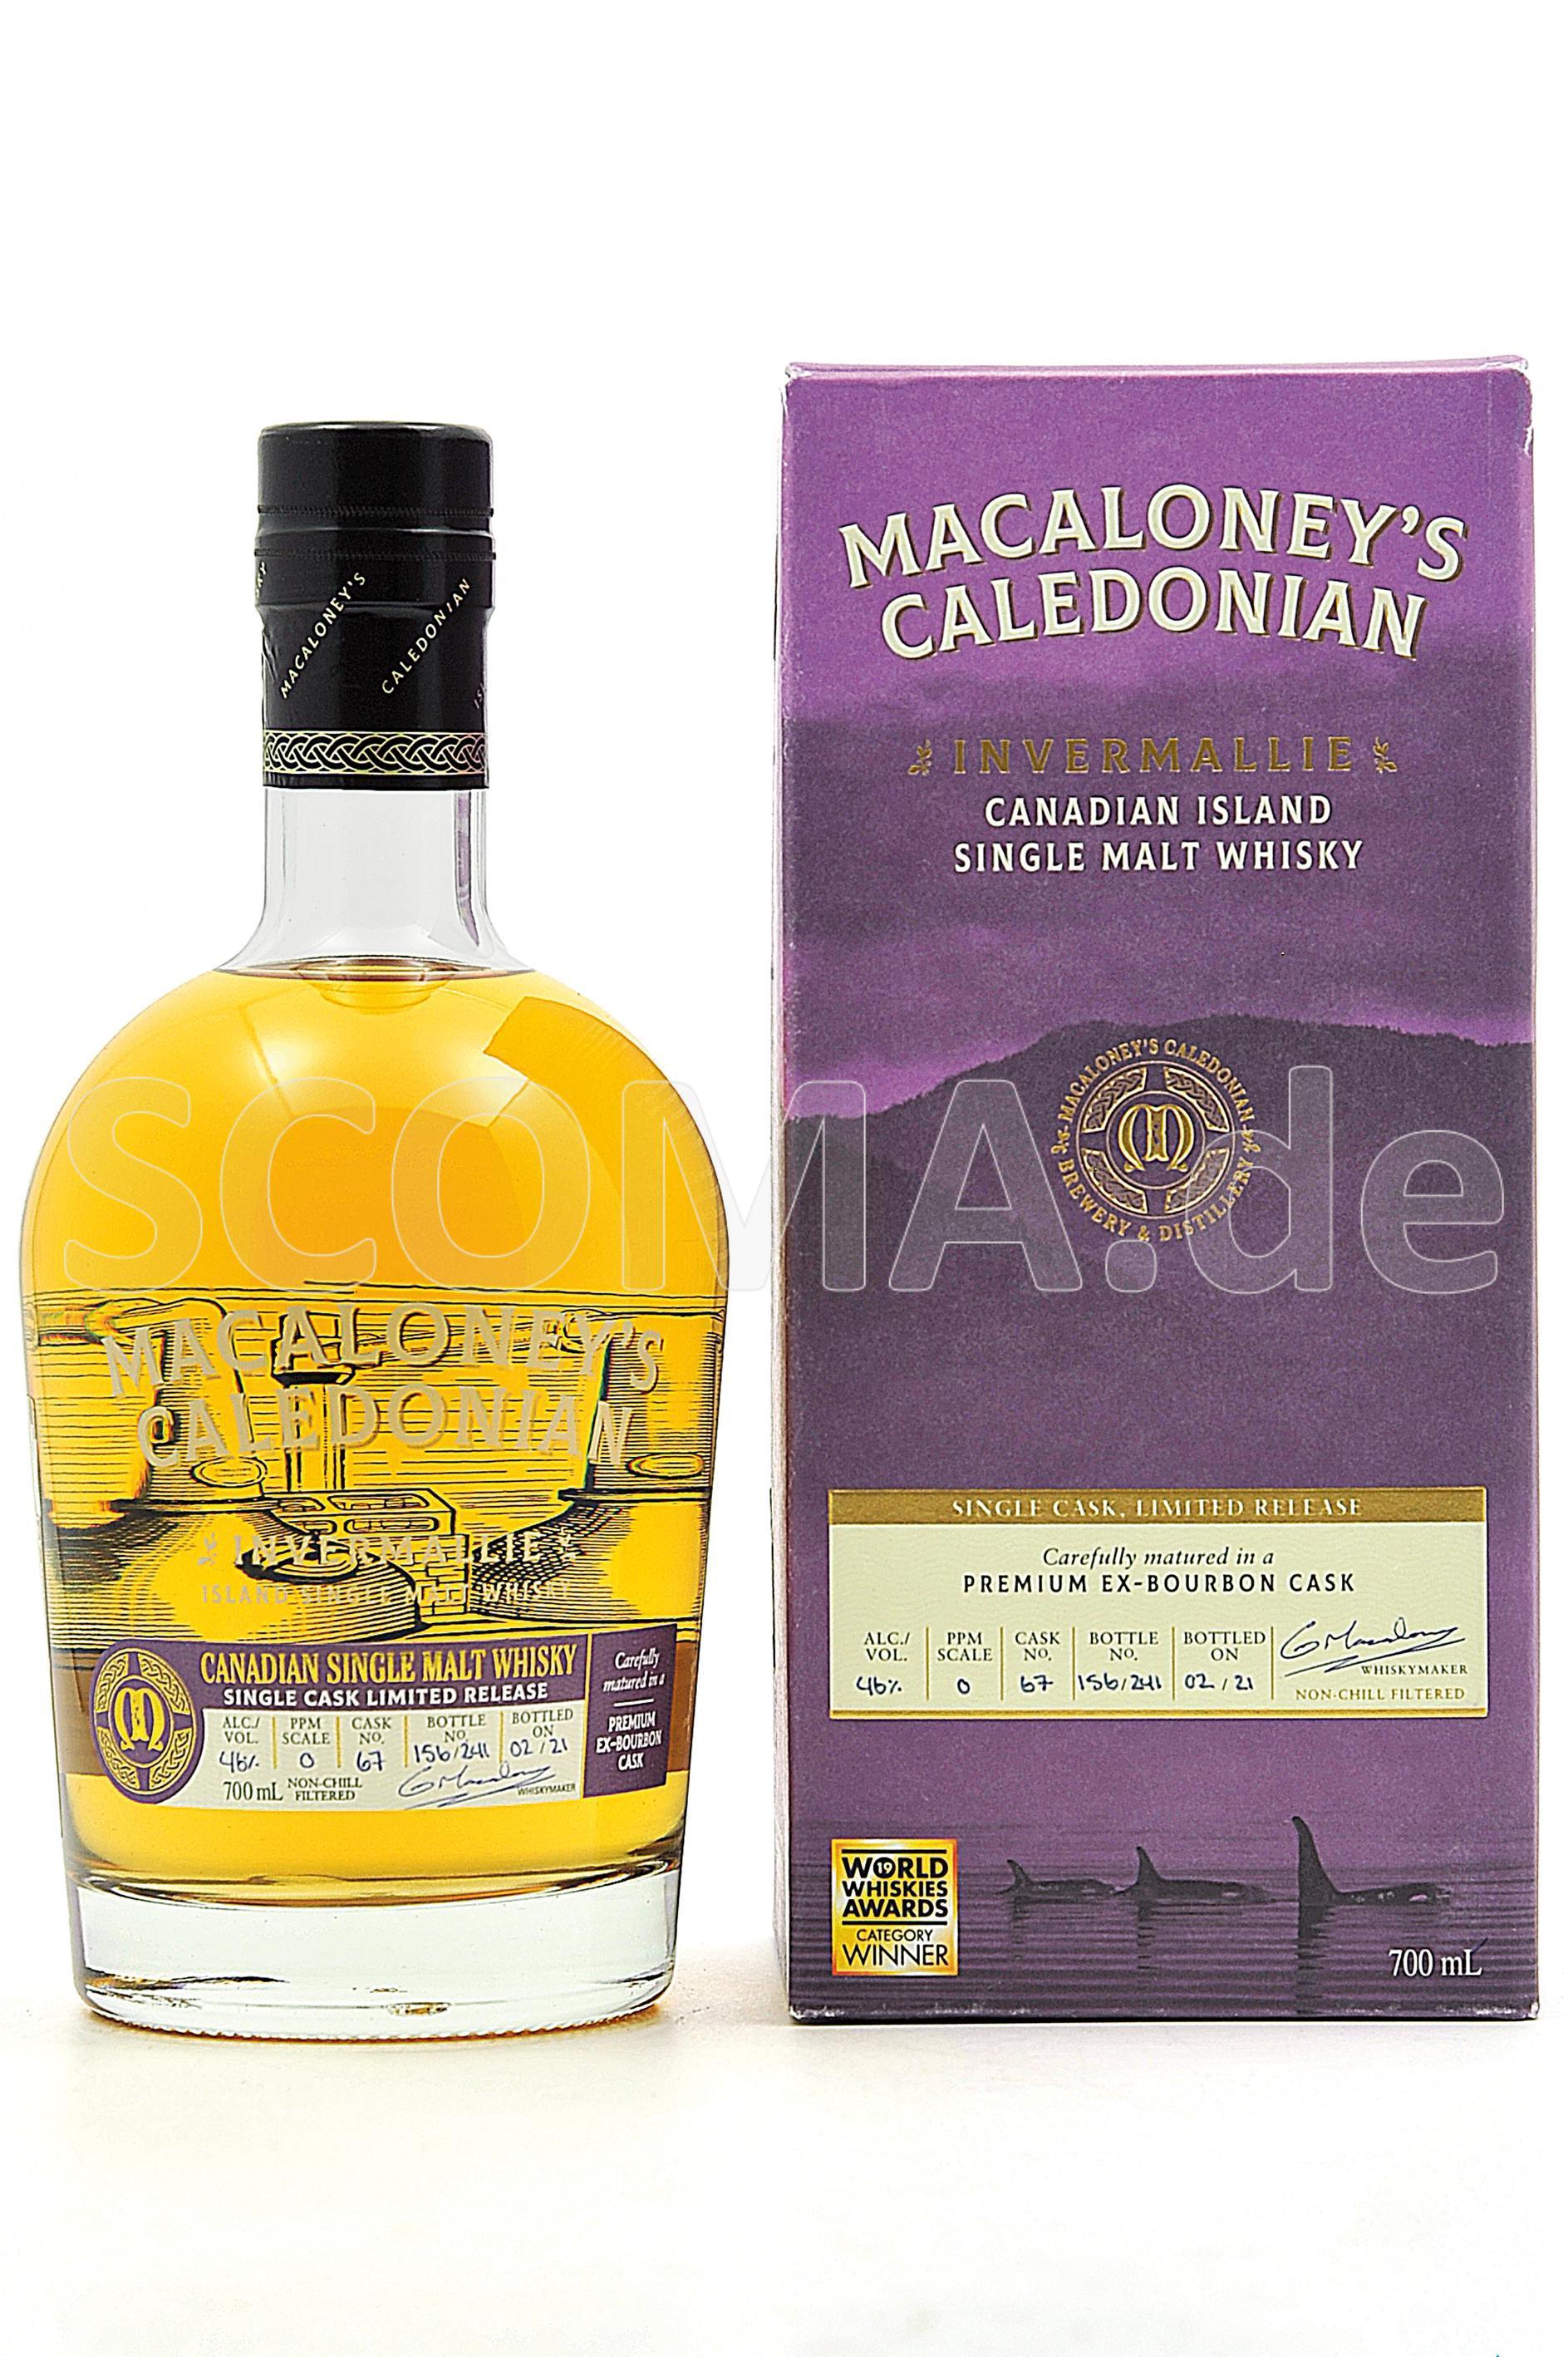 Macaloney's Caledonian Inverma...